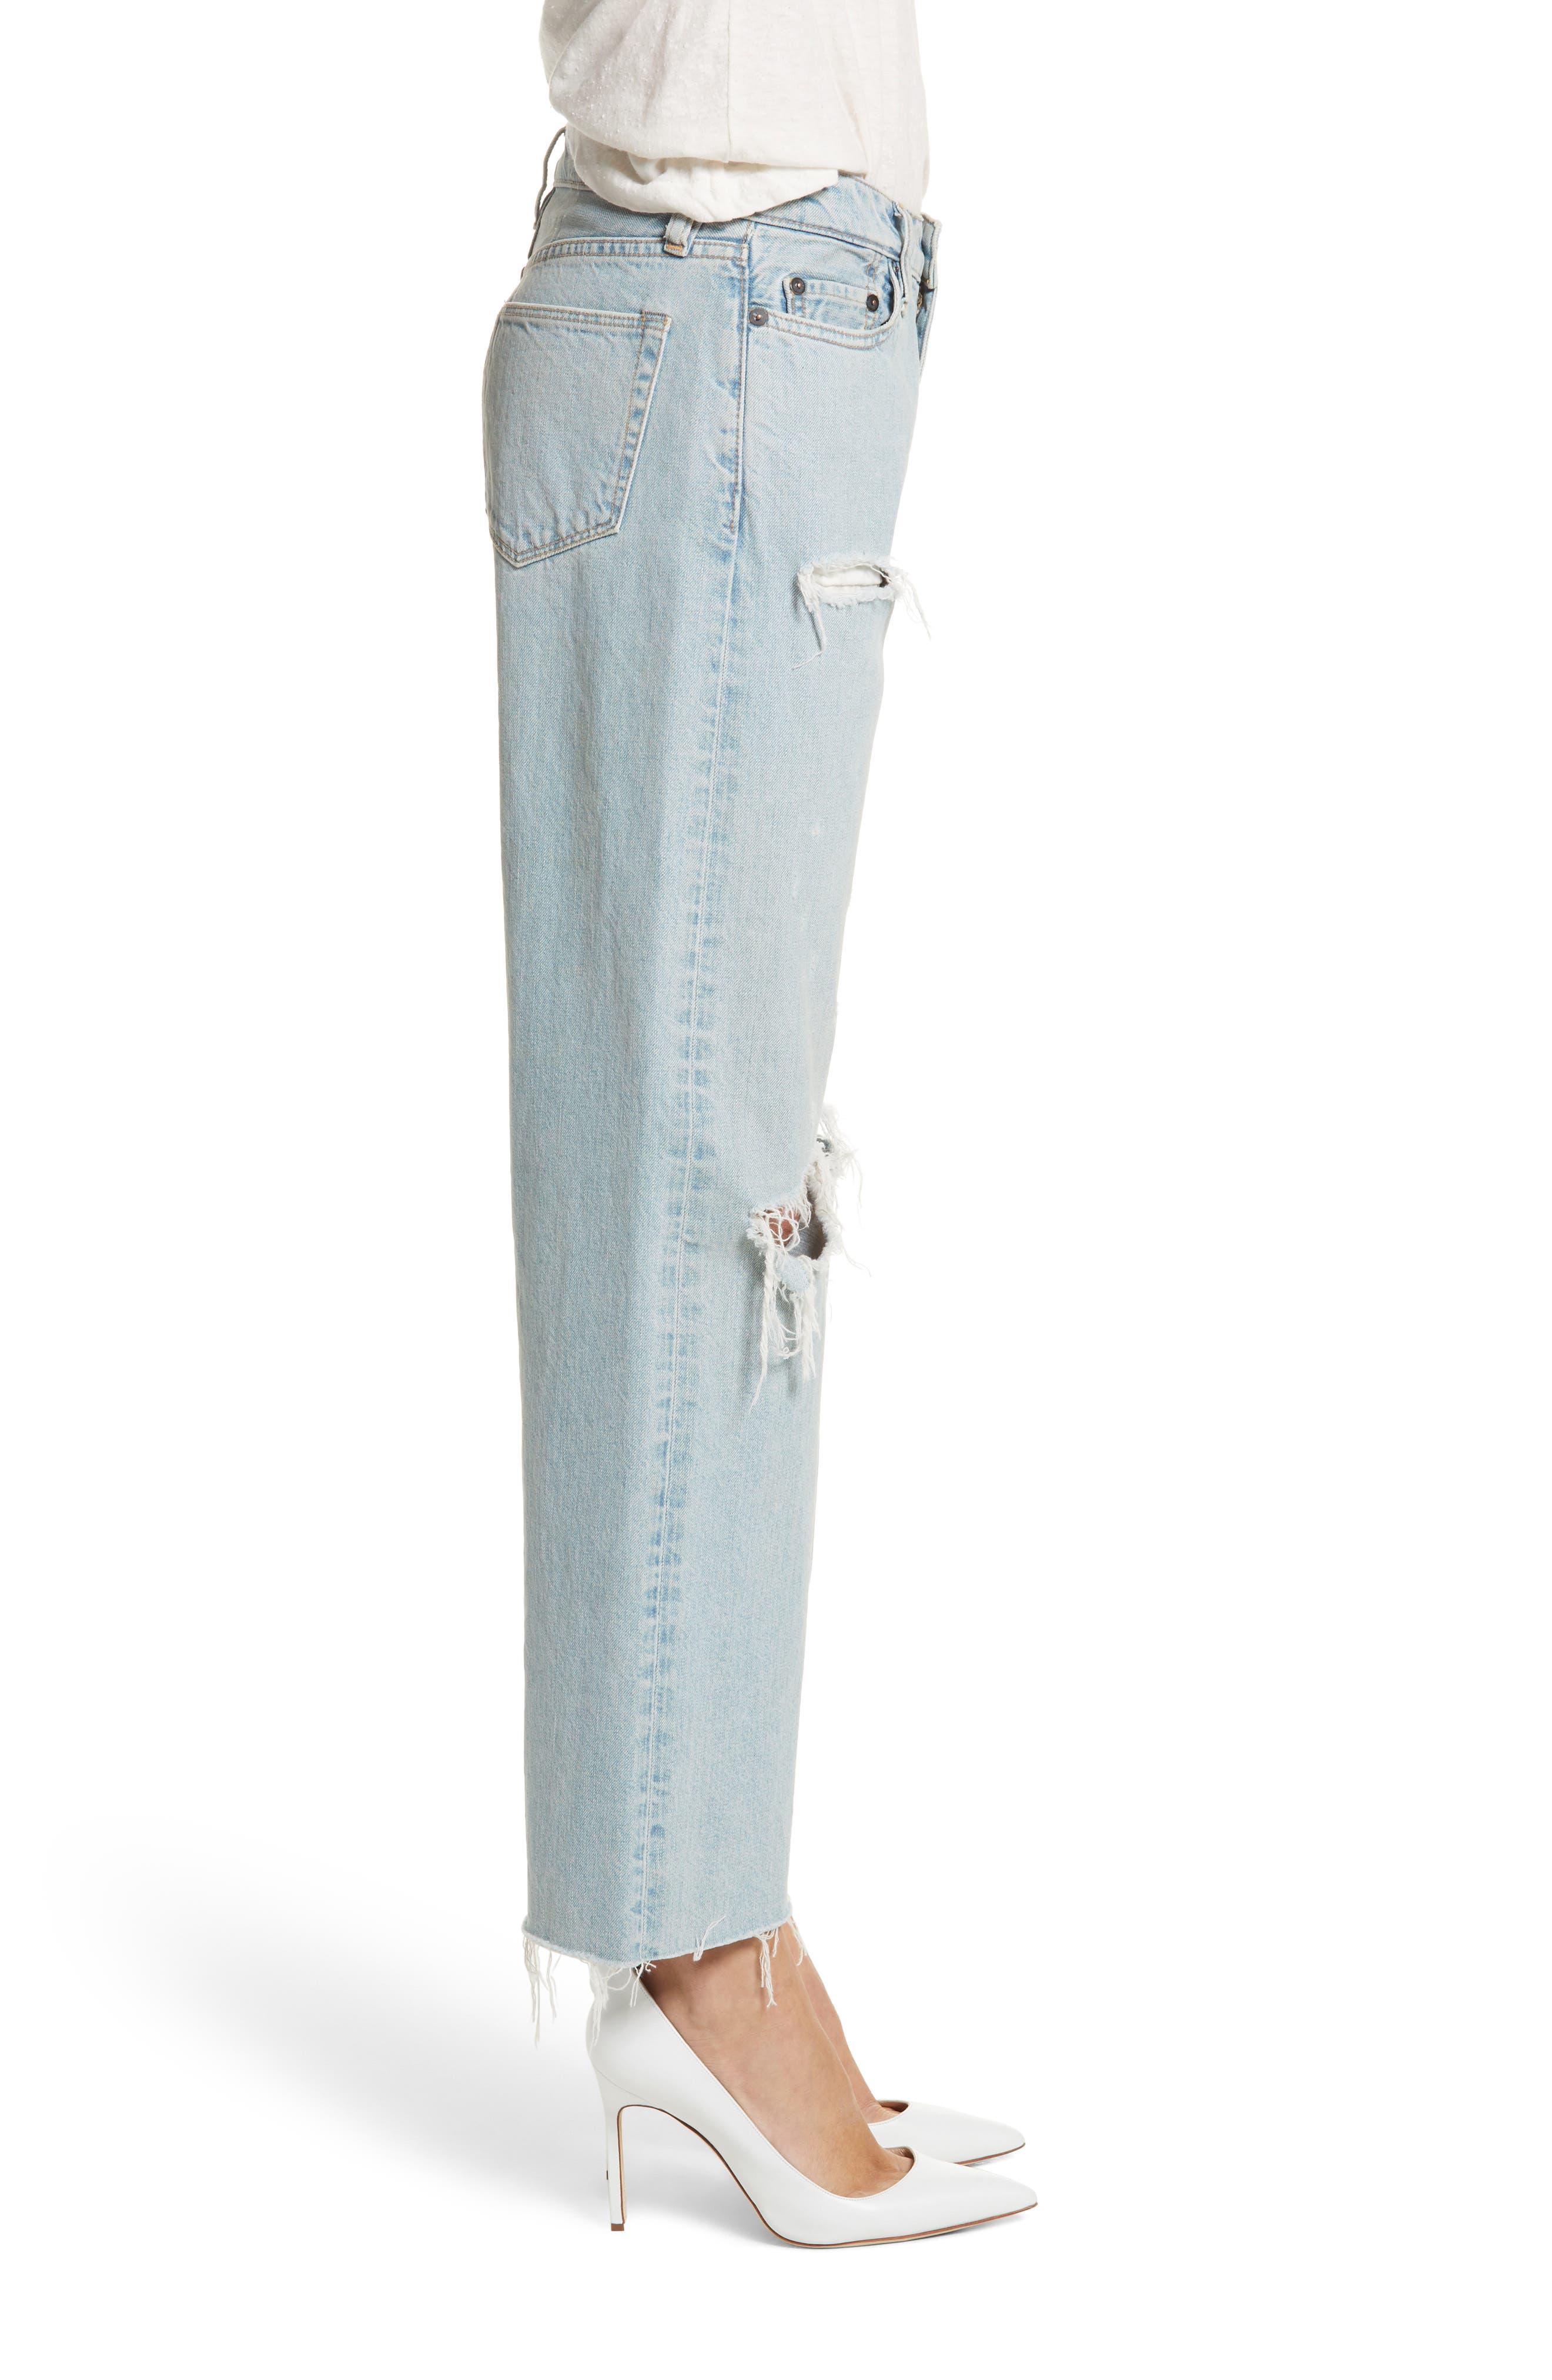 Tibbee Ripped Jeans,                             Alternate thumbnail 4, color,                             Light Indigo